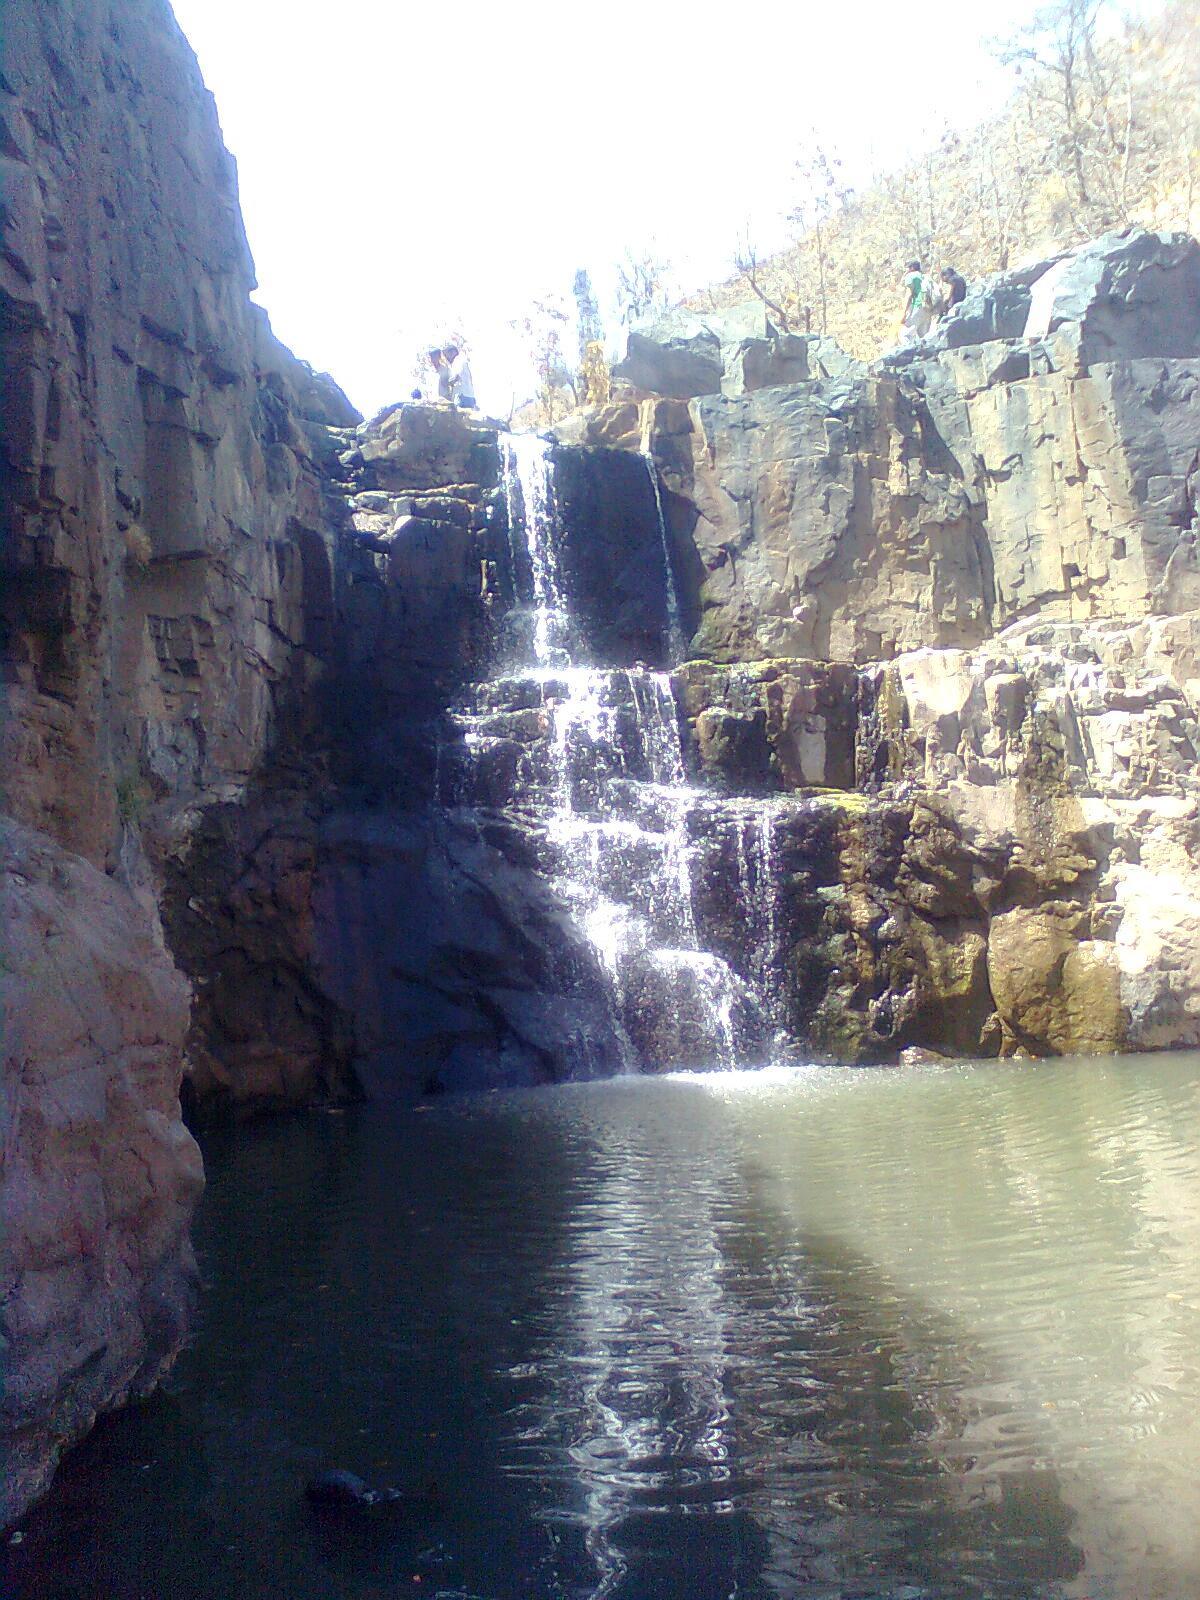 The Zarwani Waterfalls Experience